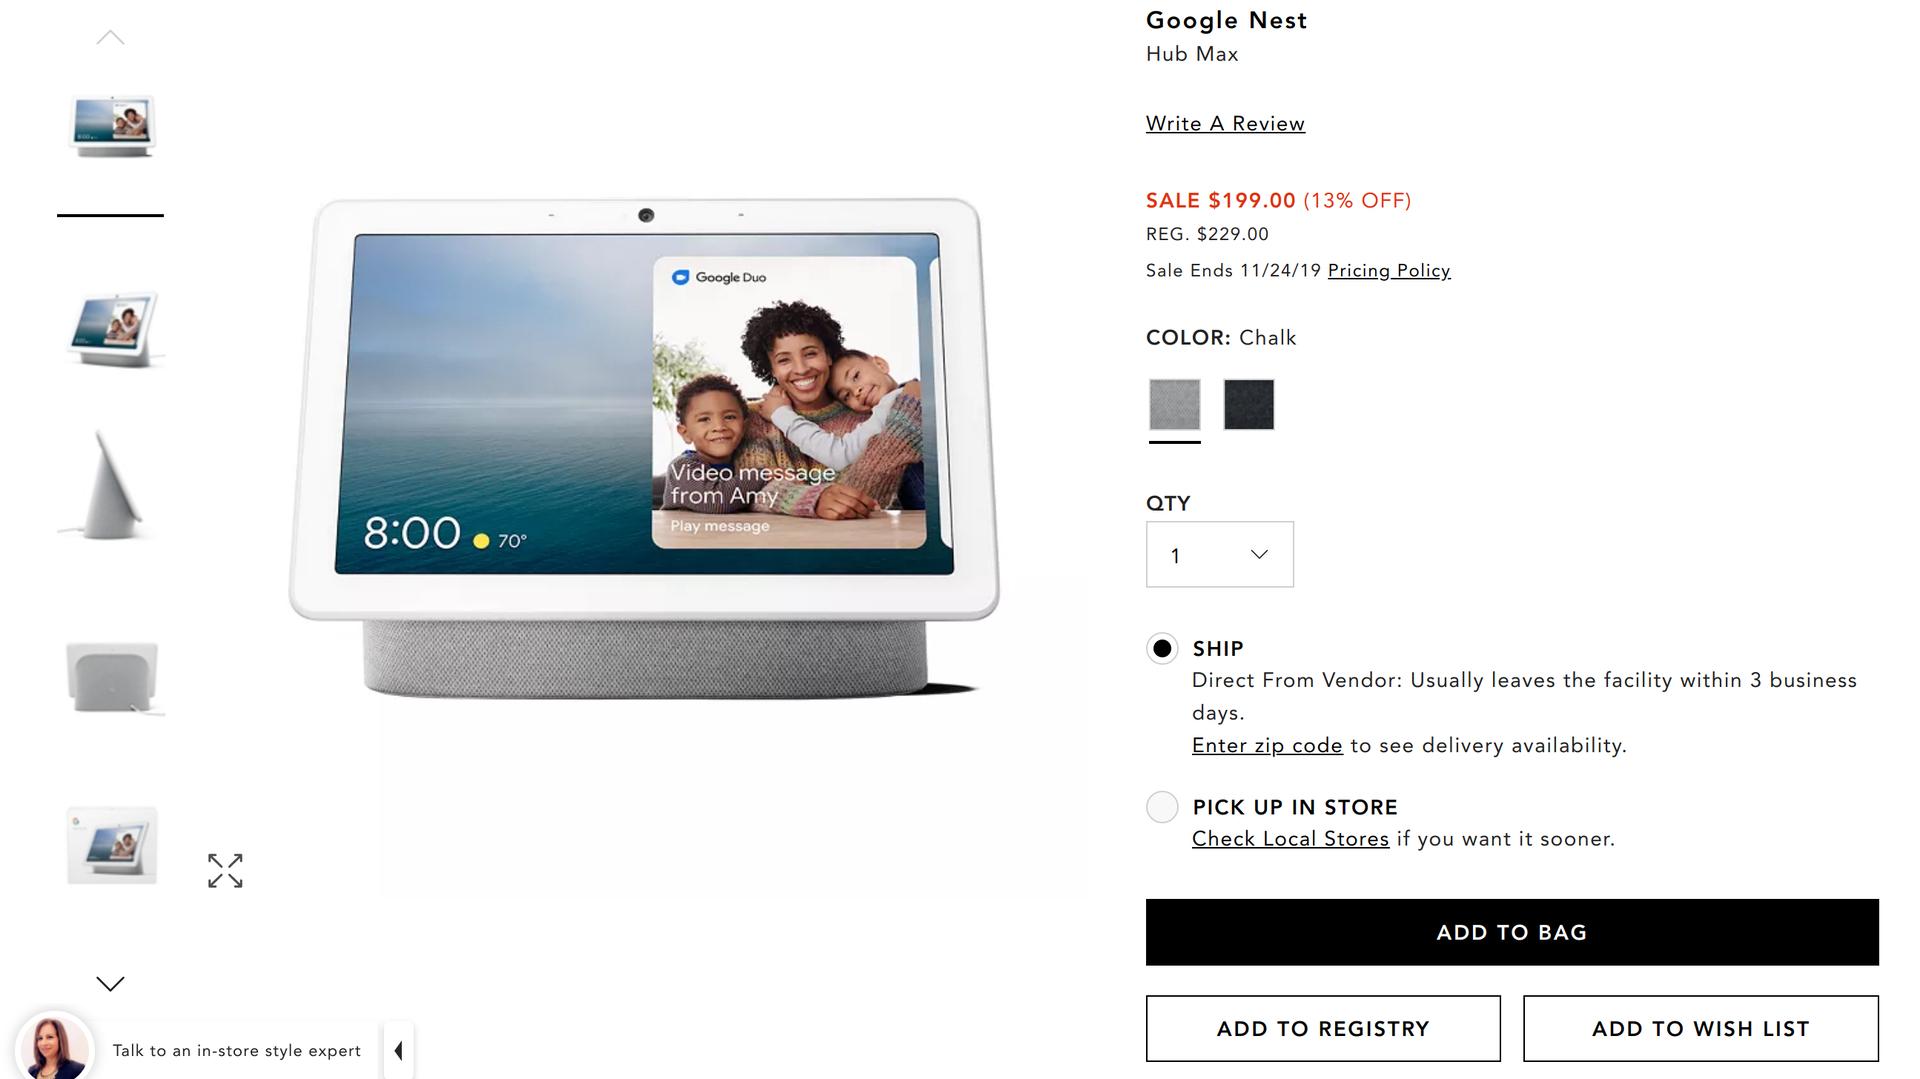 Google Nest Hub Max Bloomingdales deal